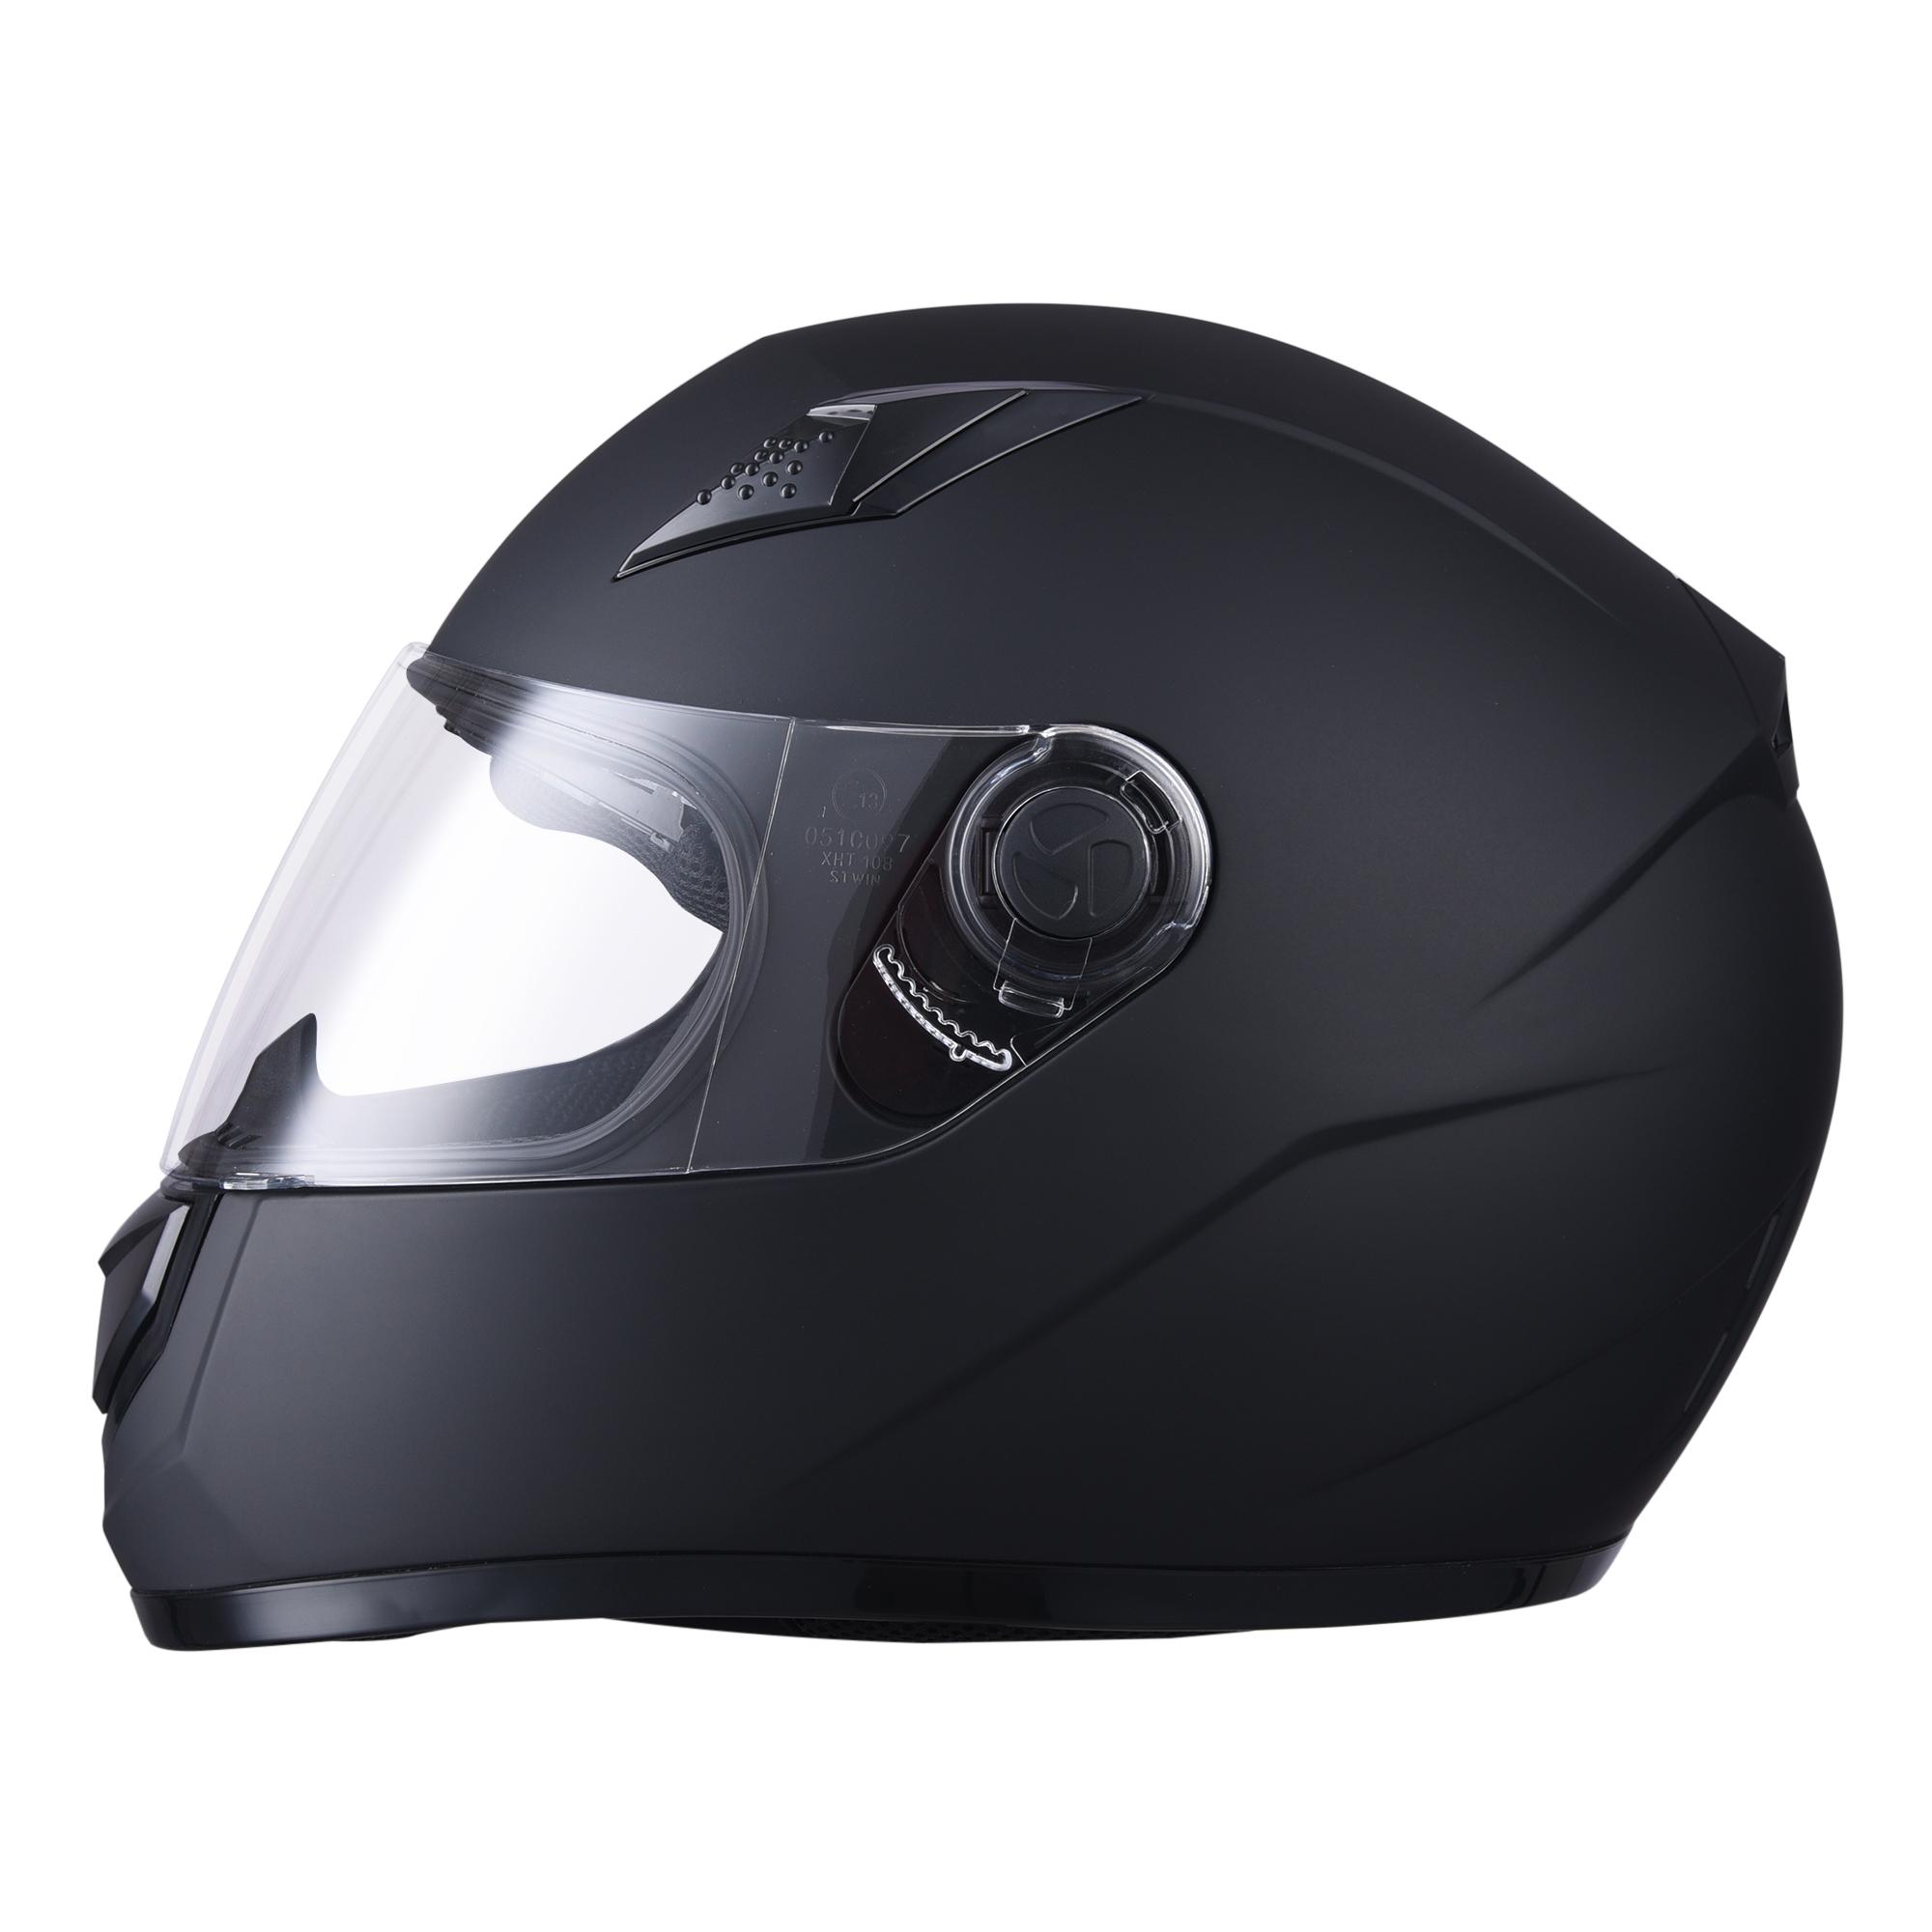 miniature 99 - AHR K12 Full Face Motorcycle Helmet DOT Air Vents Clear Visor Racing S M L XL